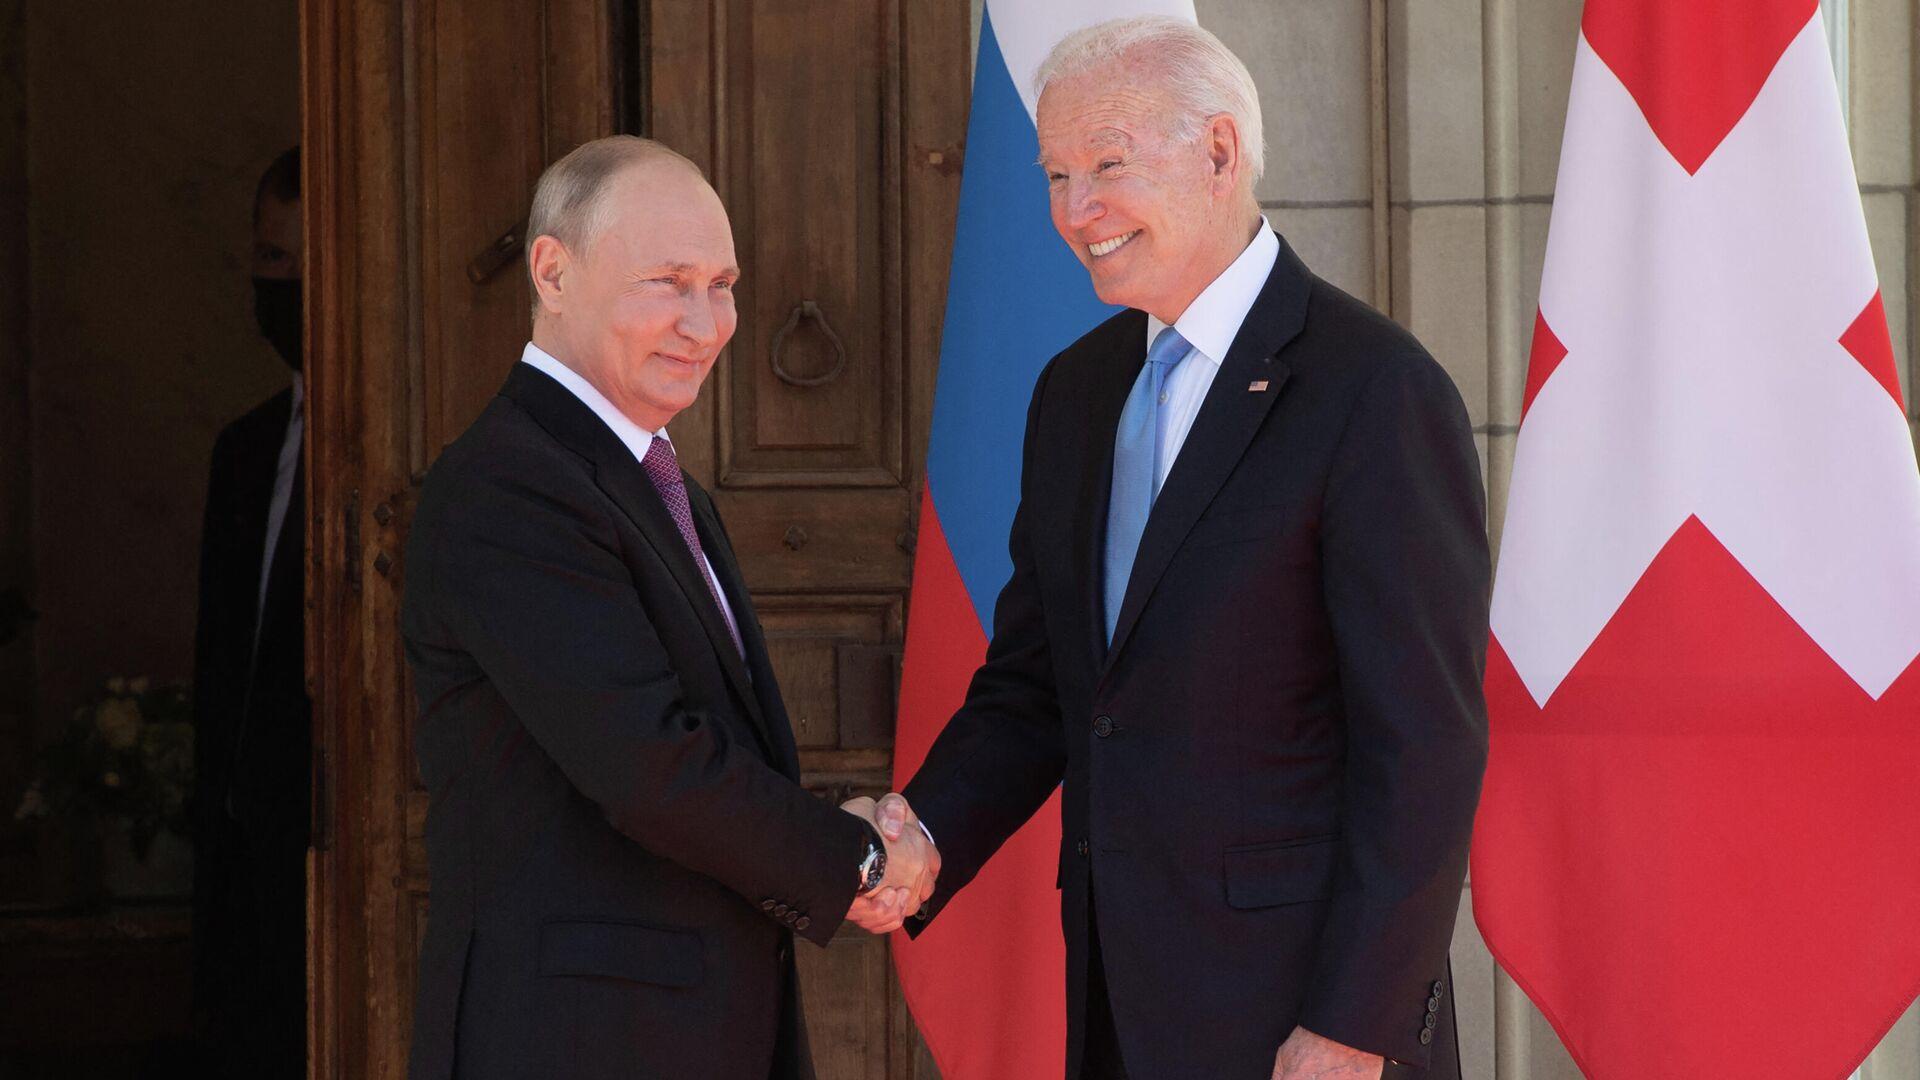 Президент США Джо Байден (справа) и президент России Владимир Путин - Sputnik Таджикистан, 1920, 18.06.2021